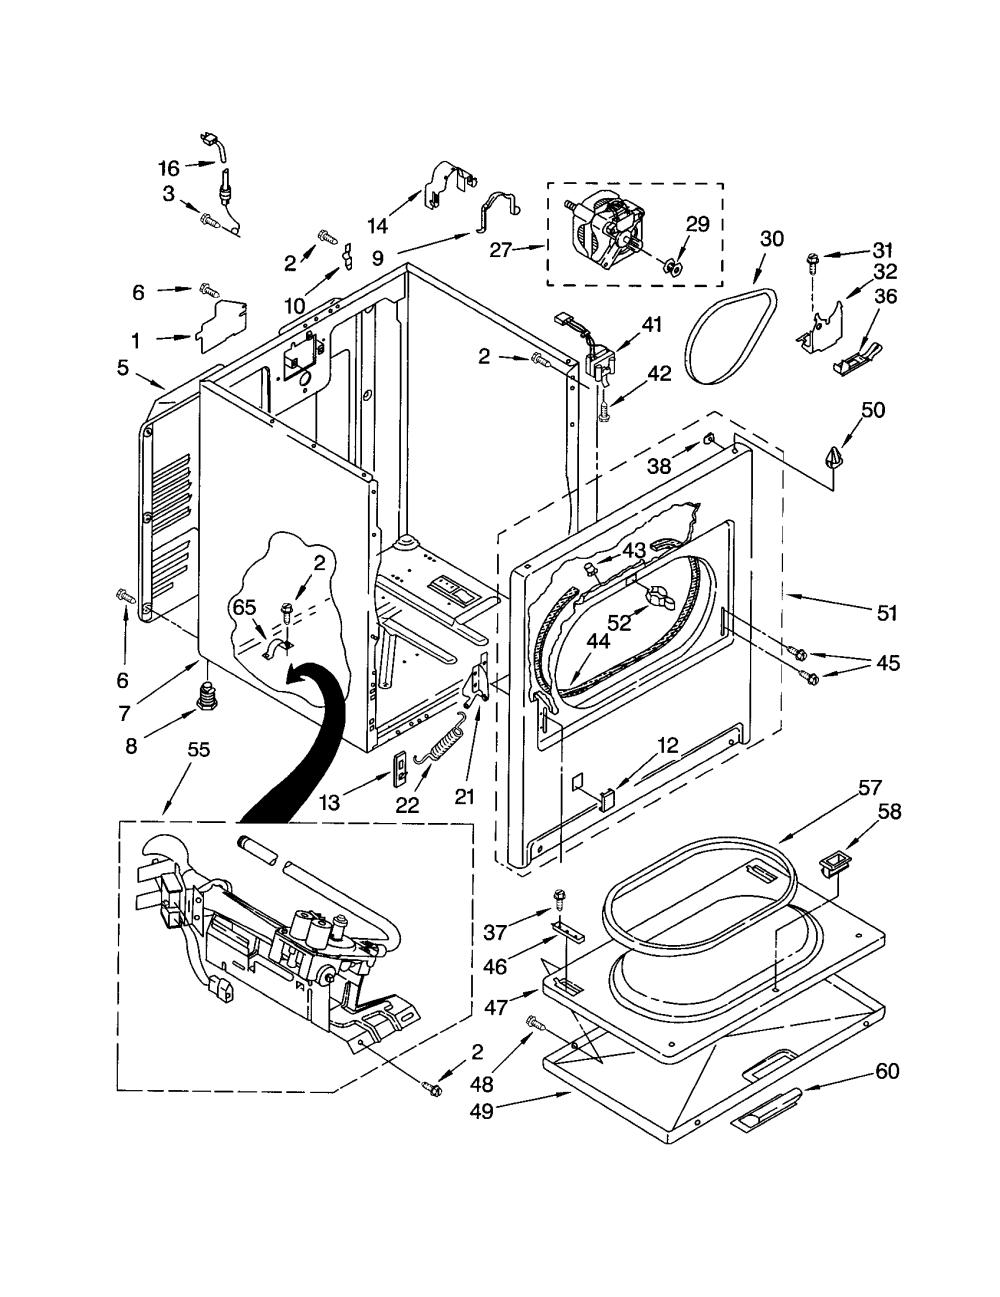 medium resolution of wiring diagram for kenmore series 80 washer furthermore kenmore kenmore 80 series gas dryer wiring diagram